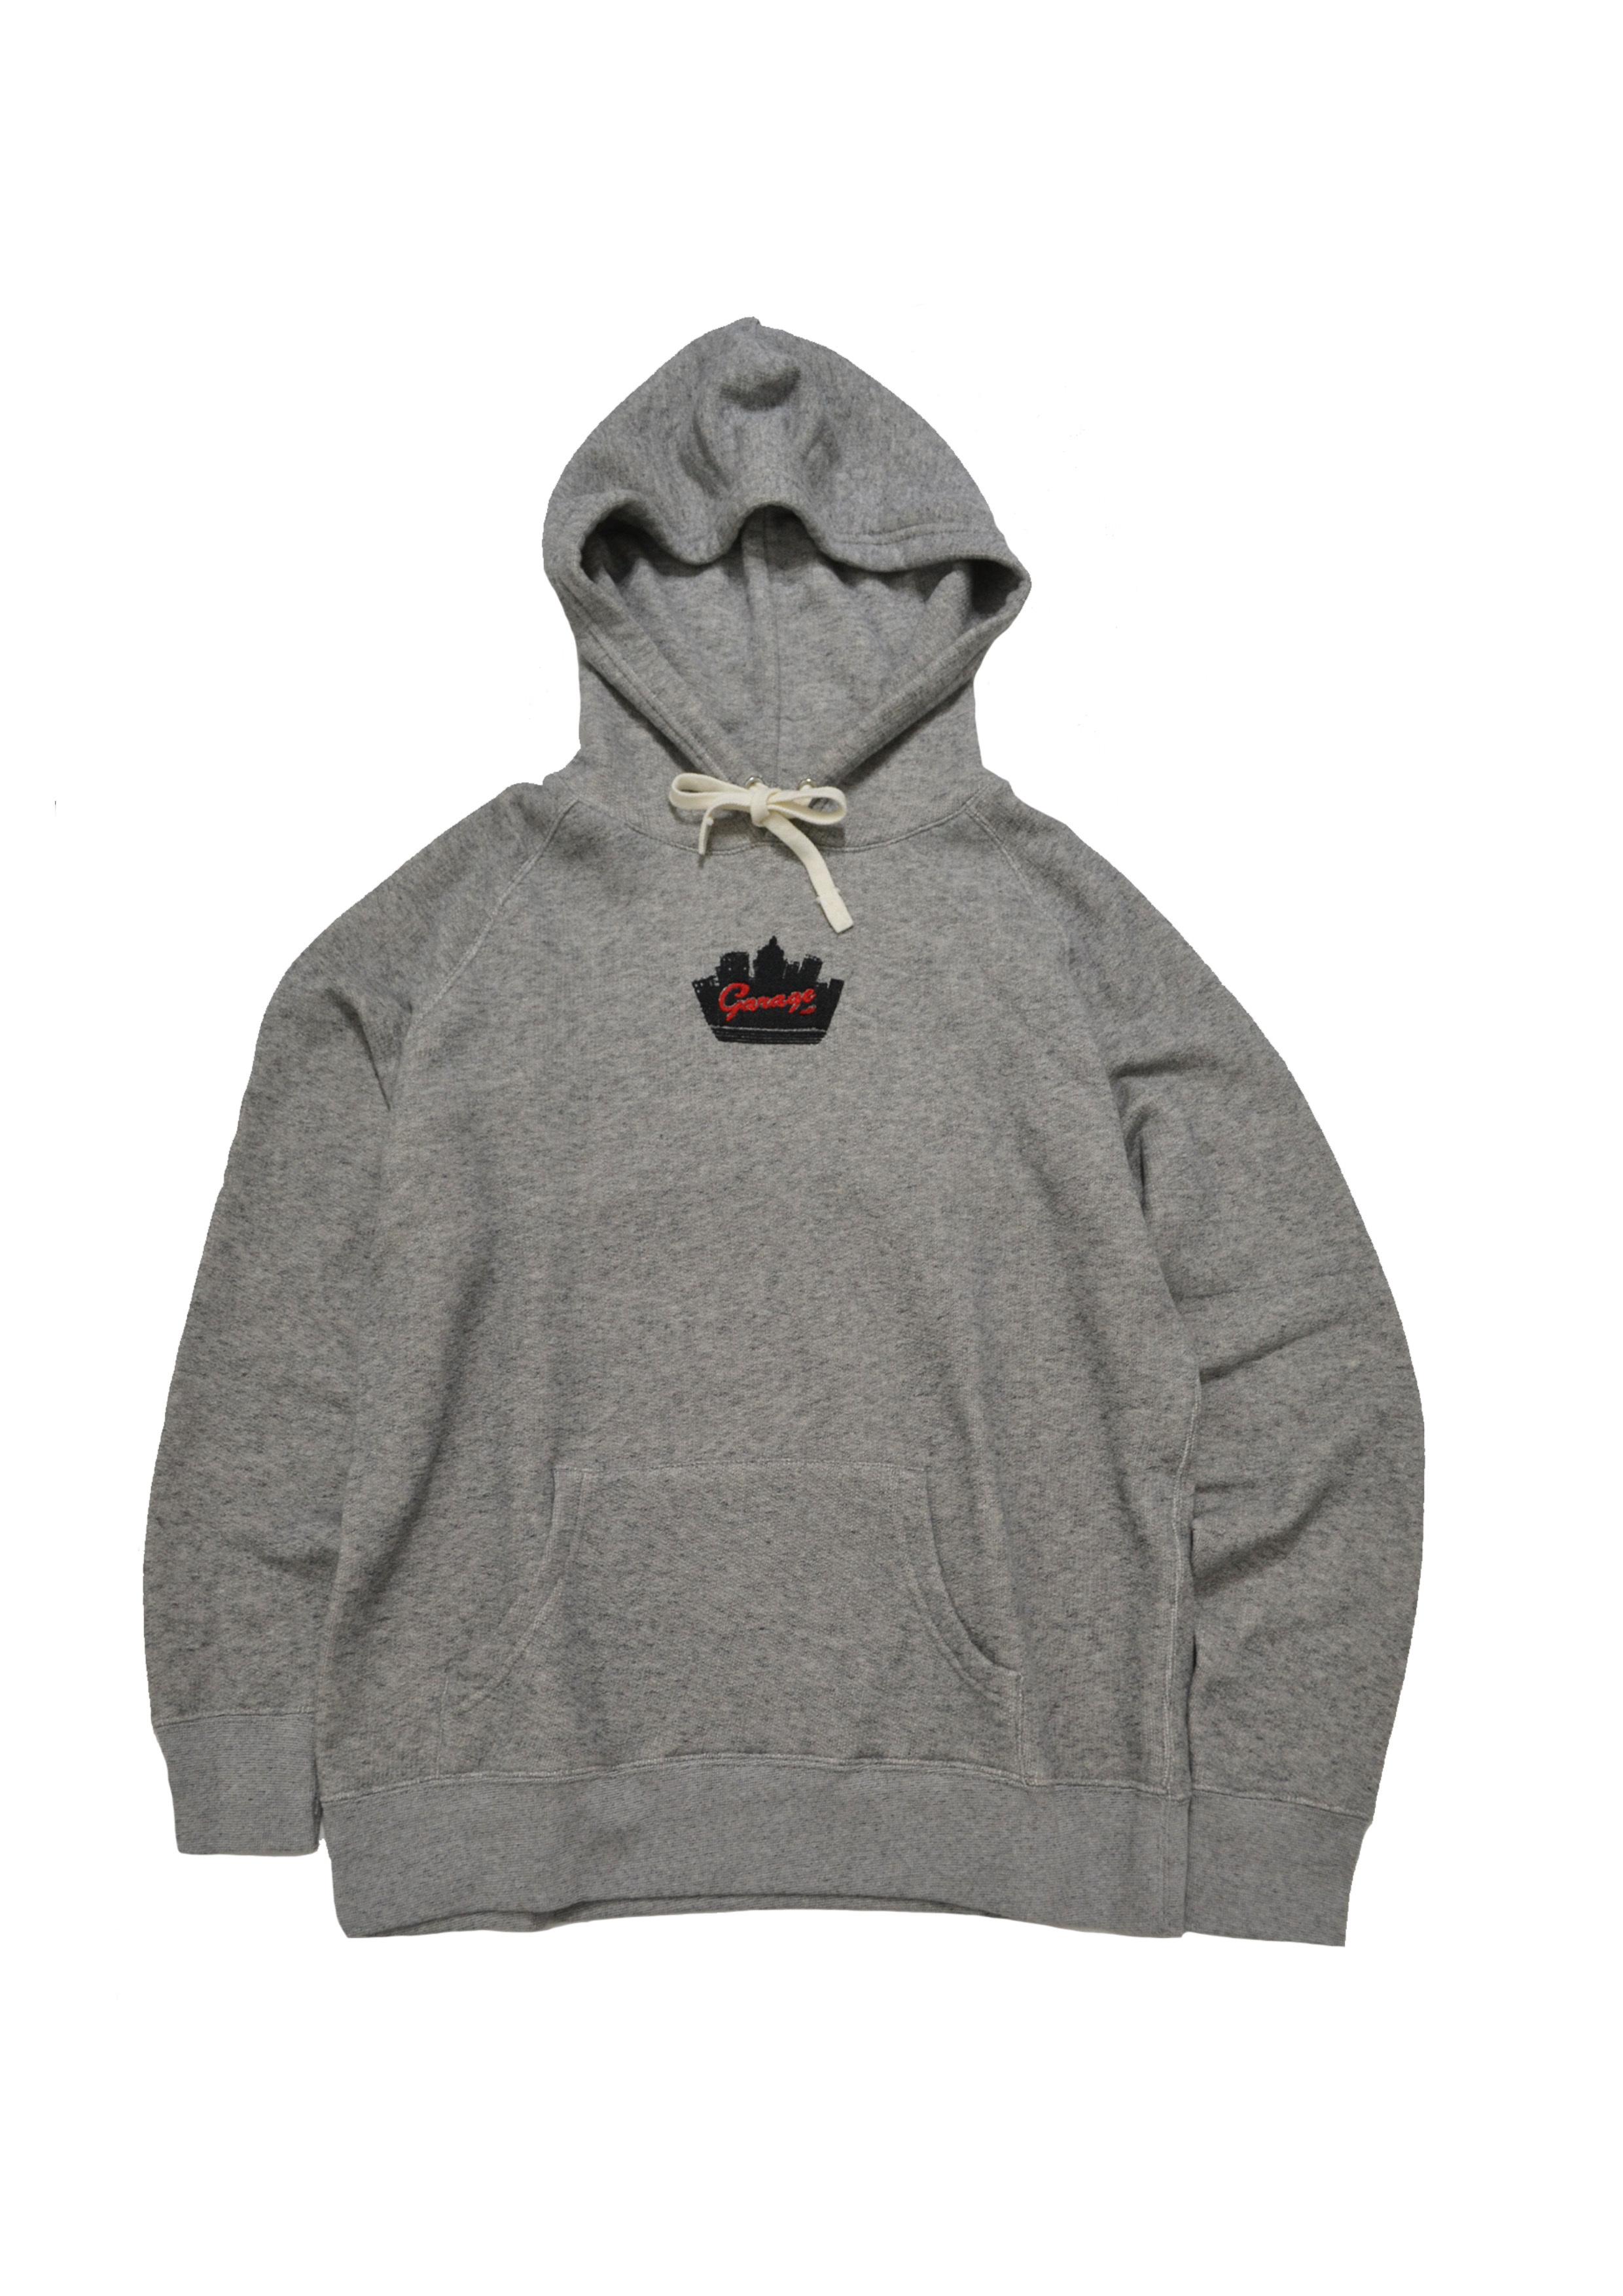 Silhouette logo hoodie Gray